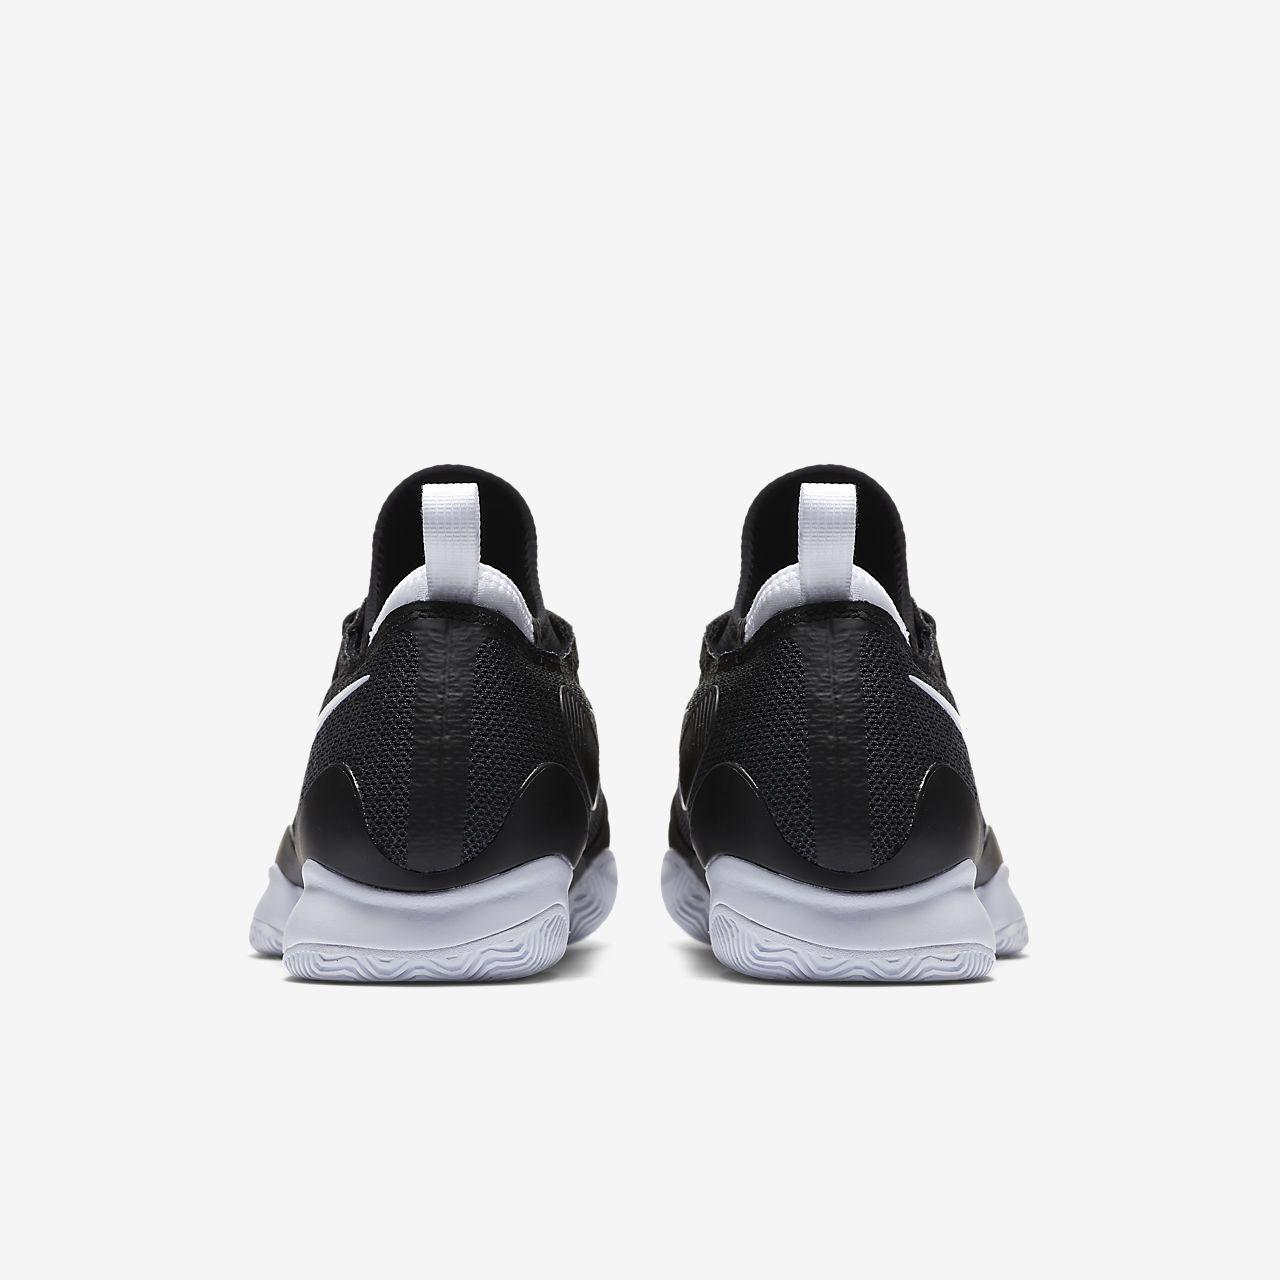 Nike PerformanceMEN AIR ZOOM ULTRA REACT HC - Outdoor tennis shoes - black/white/anthracite i2lwE